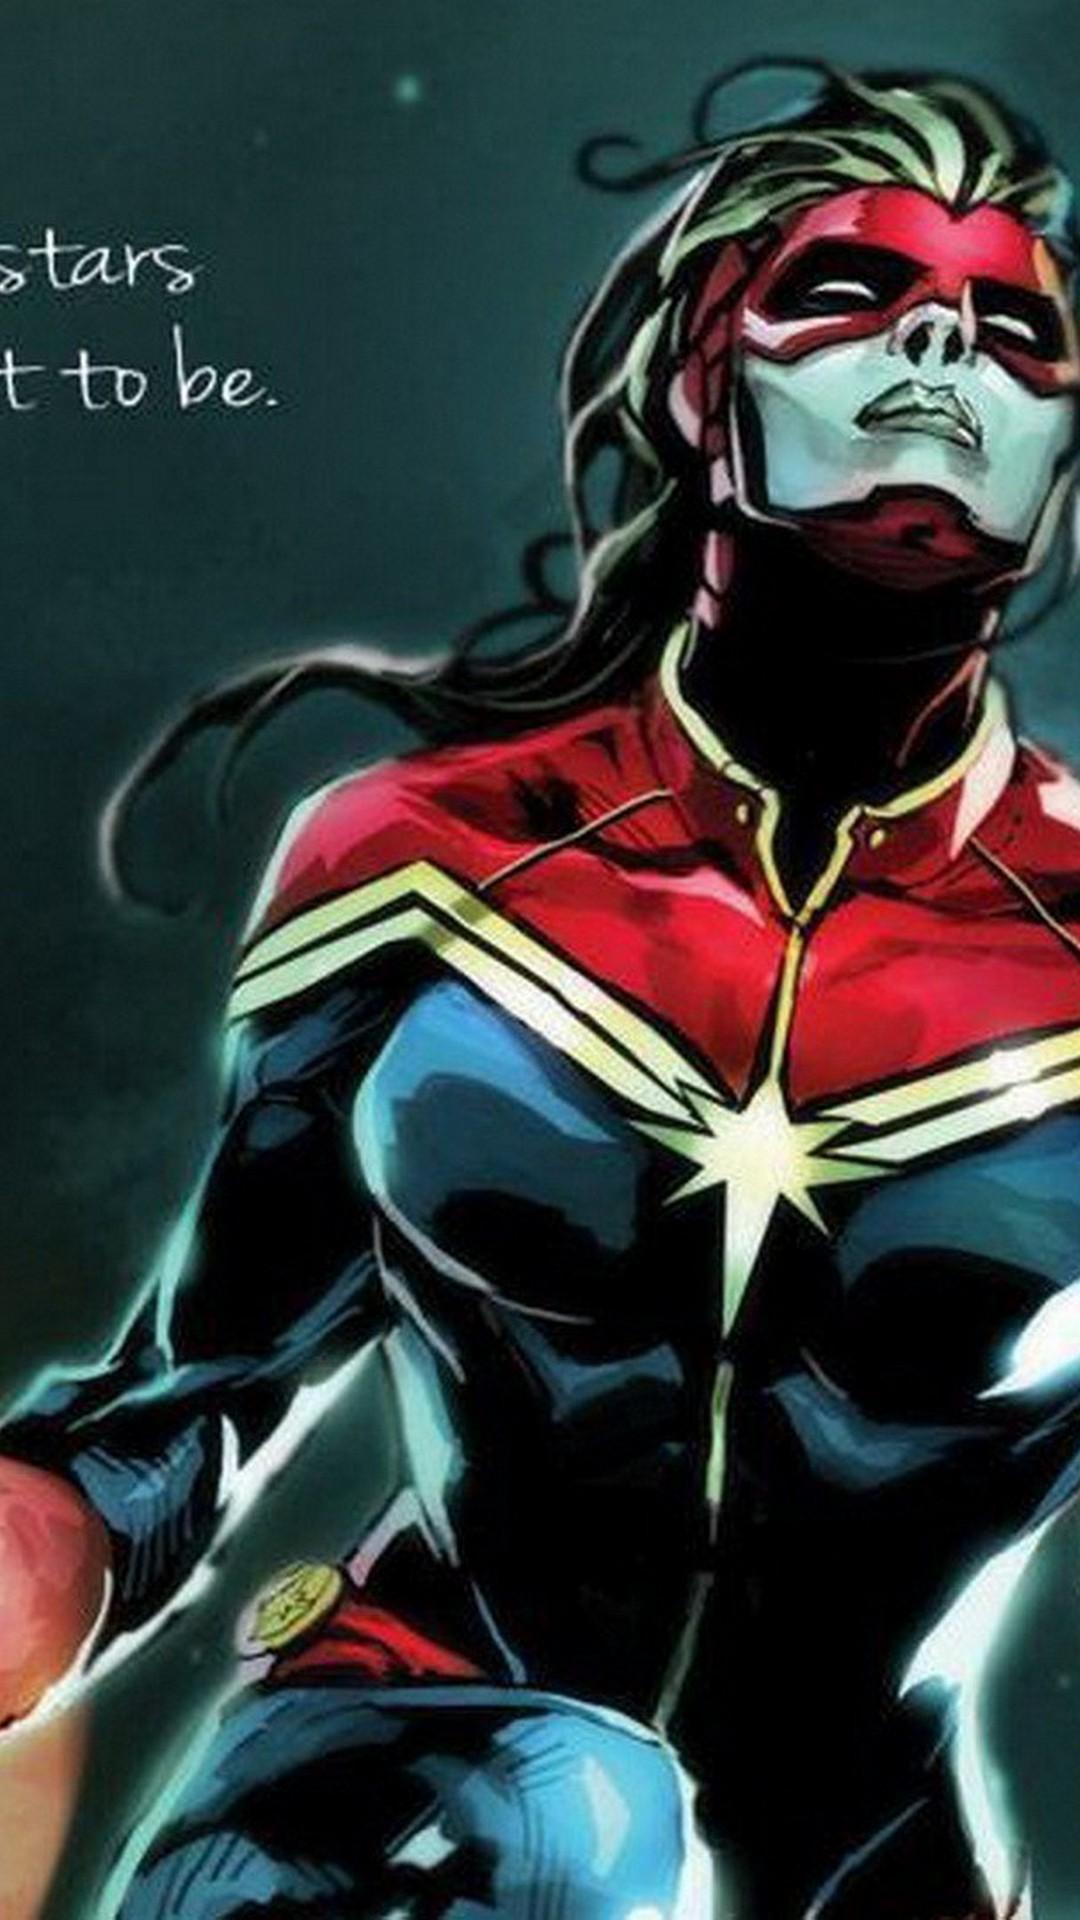 Start Download - Capitan Marvel Y Capitana Marvel , HD Wallpaper & Backgrounds